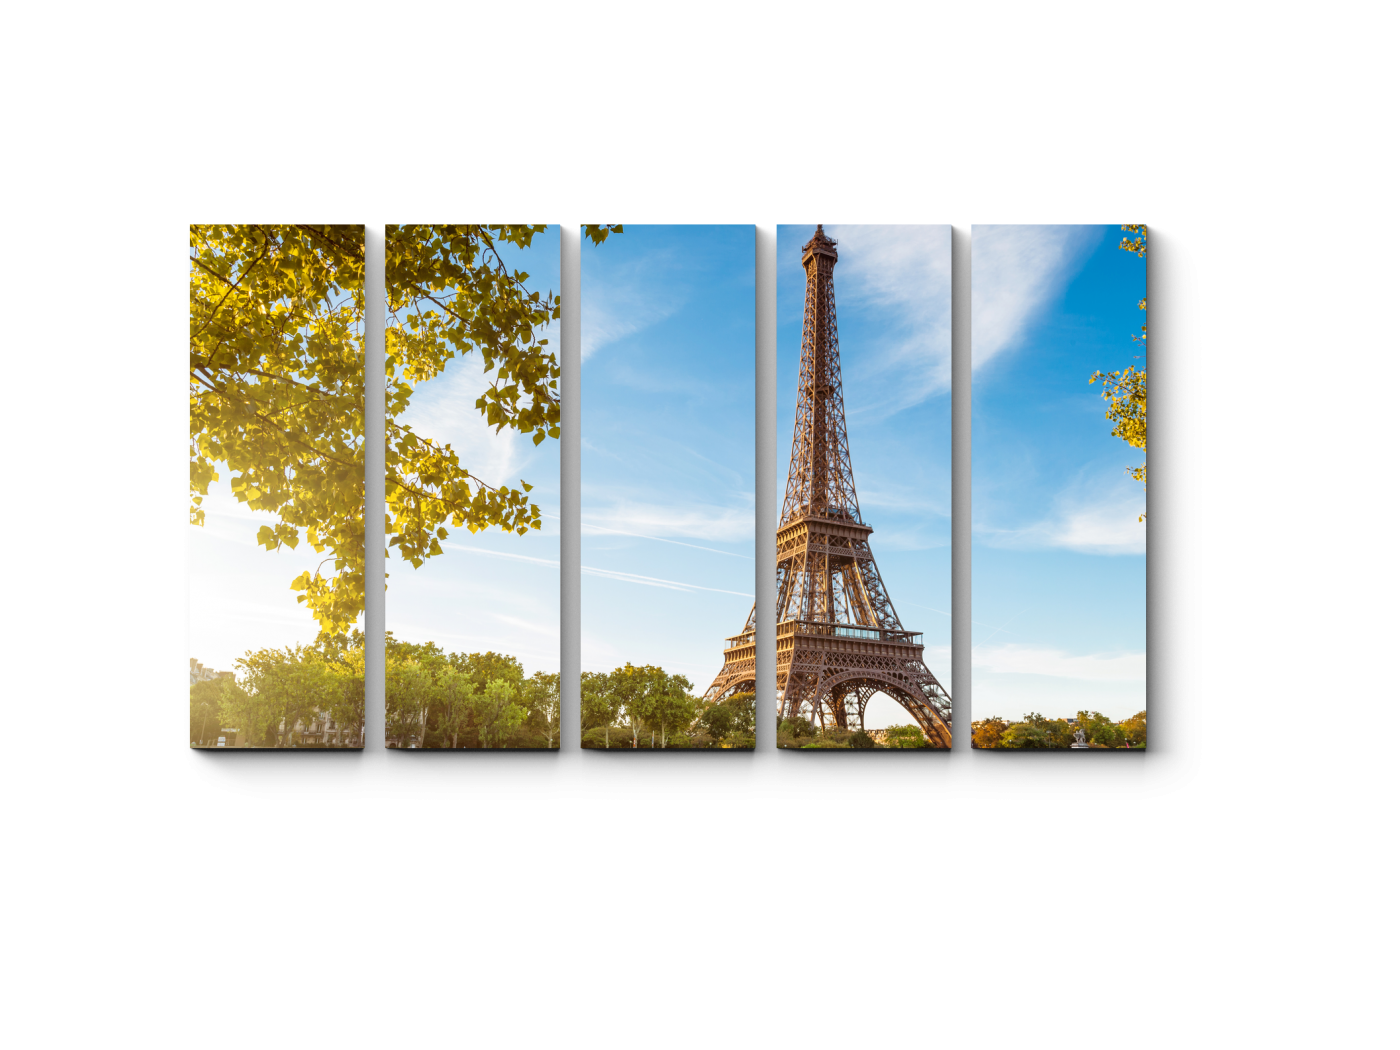 Модульная картина Ах, Париж, Париж (90x54) фото